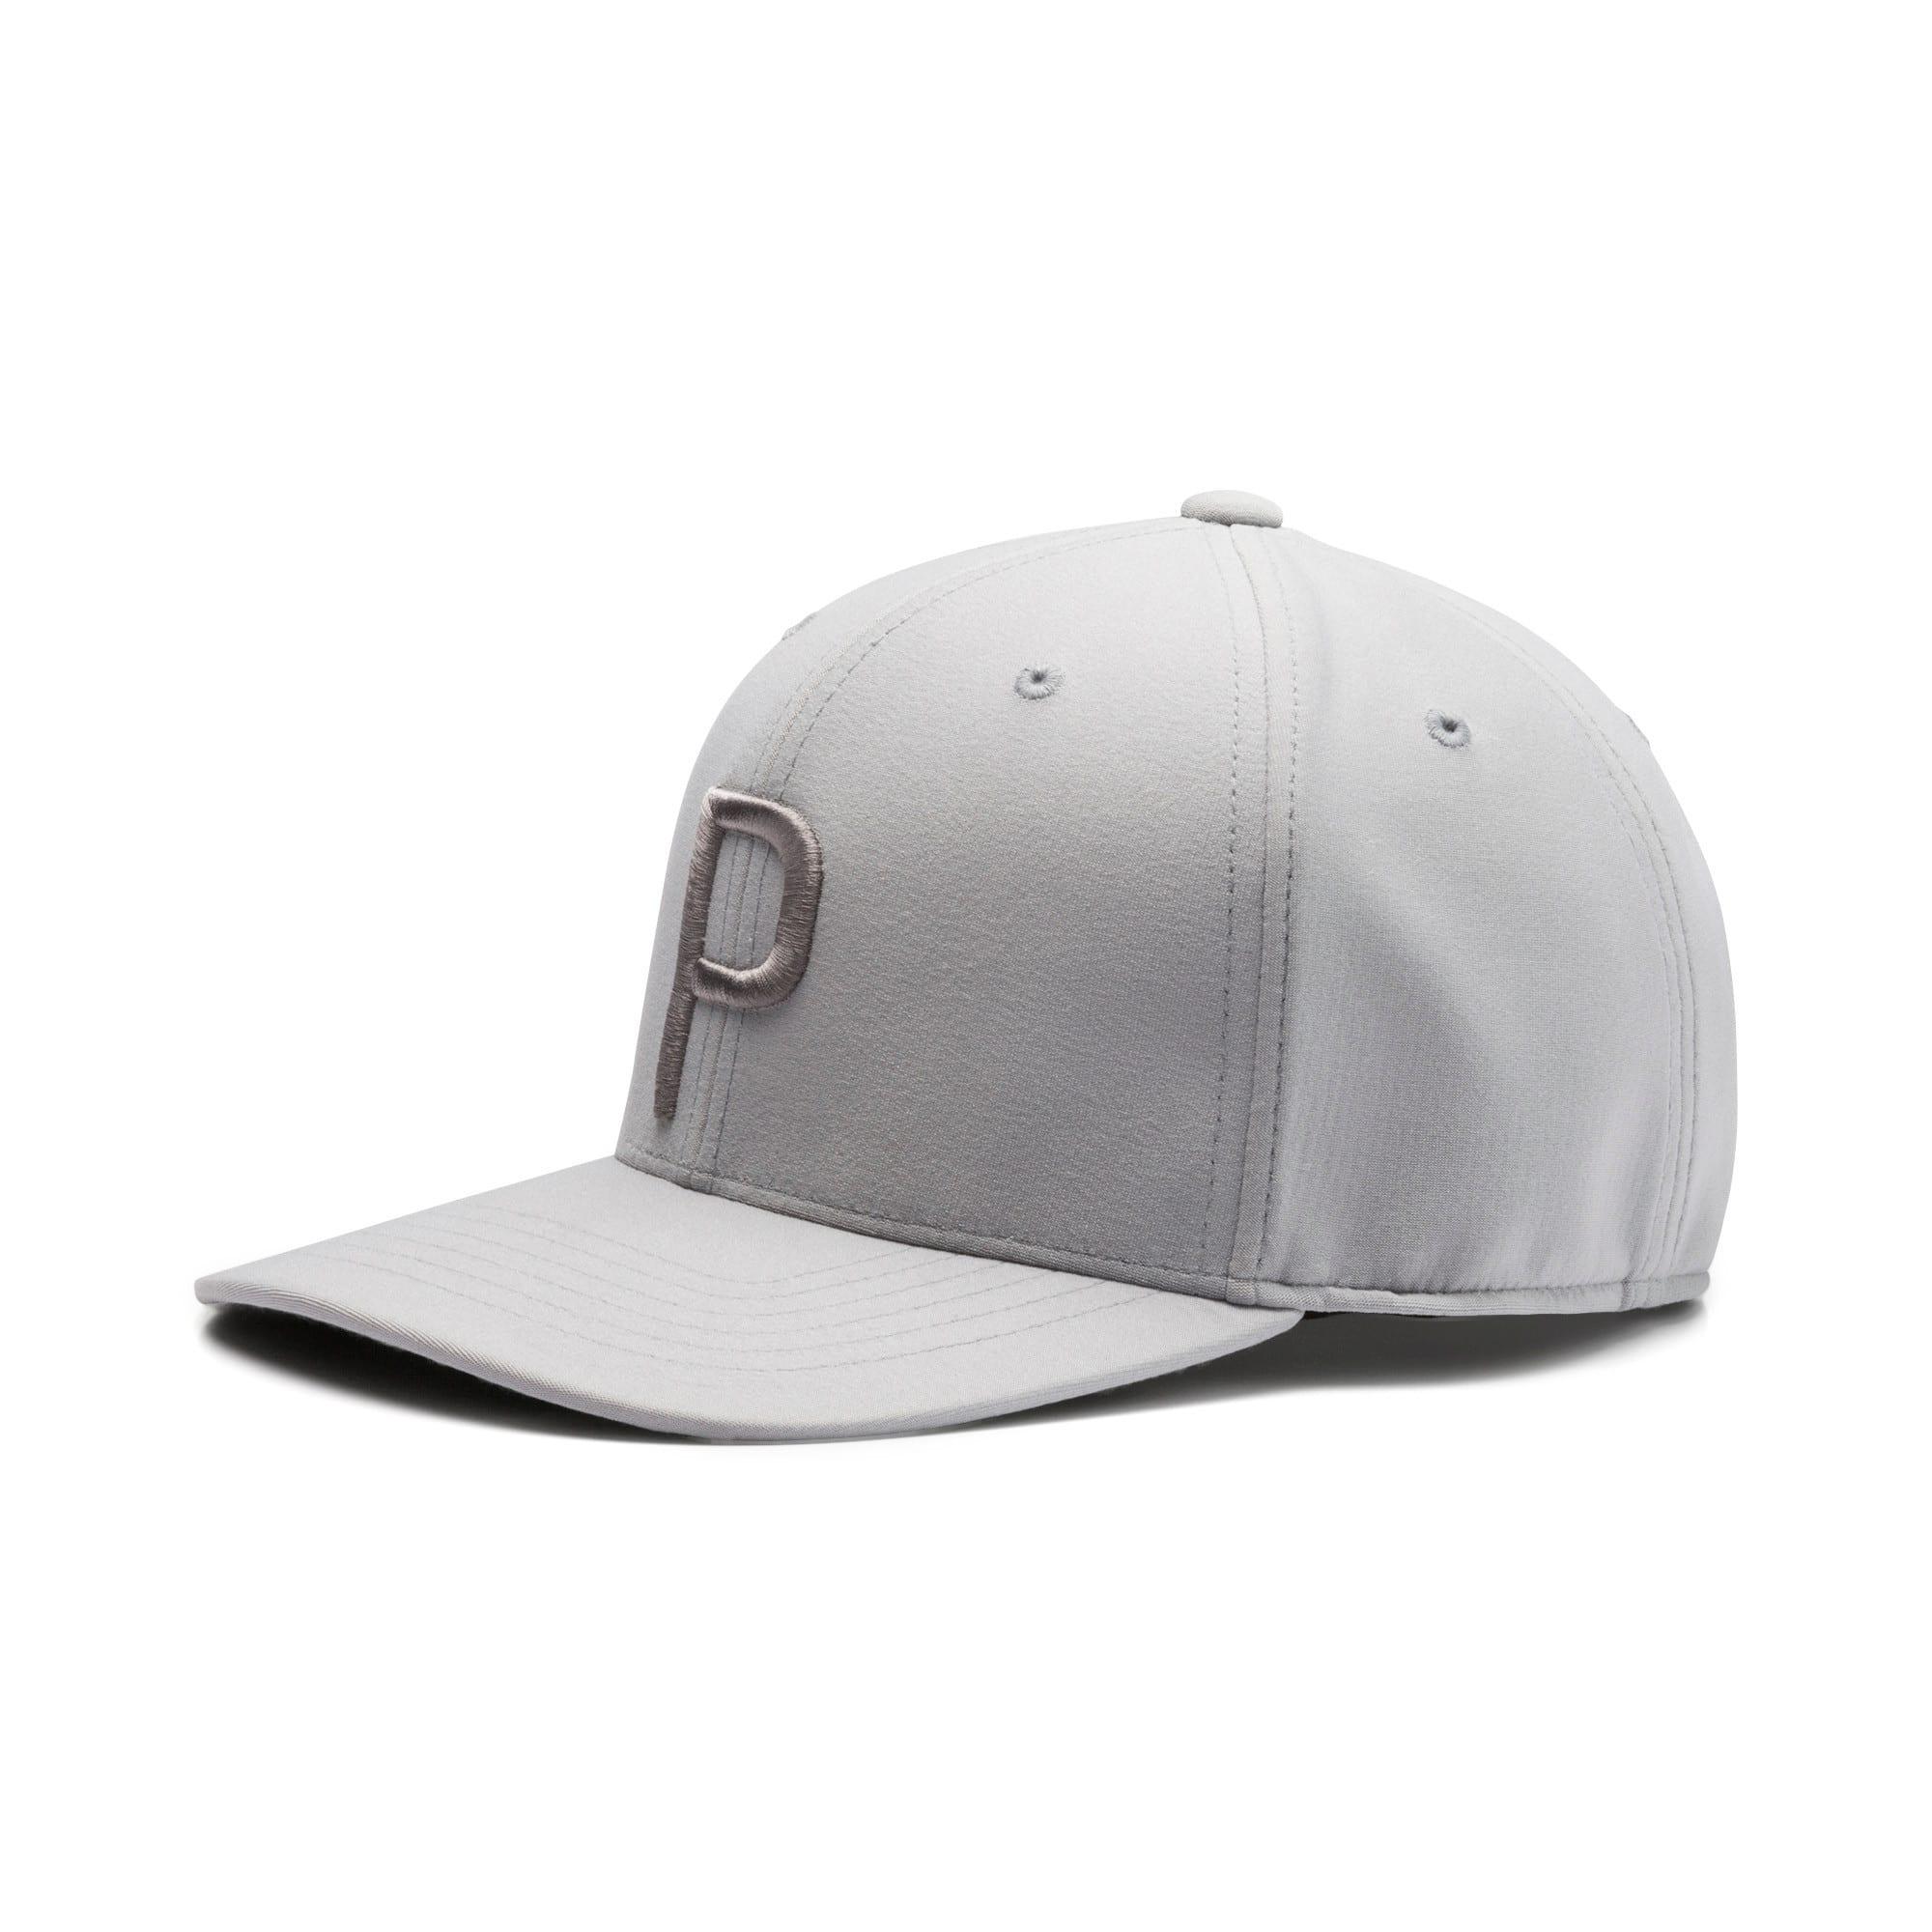 Thumbnail 1 of P Snapback Hat, Quarry-QUIET SHADE, medium